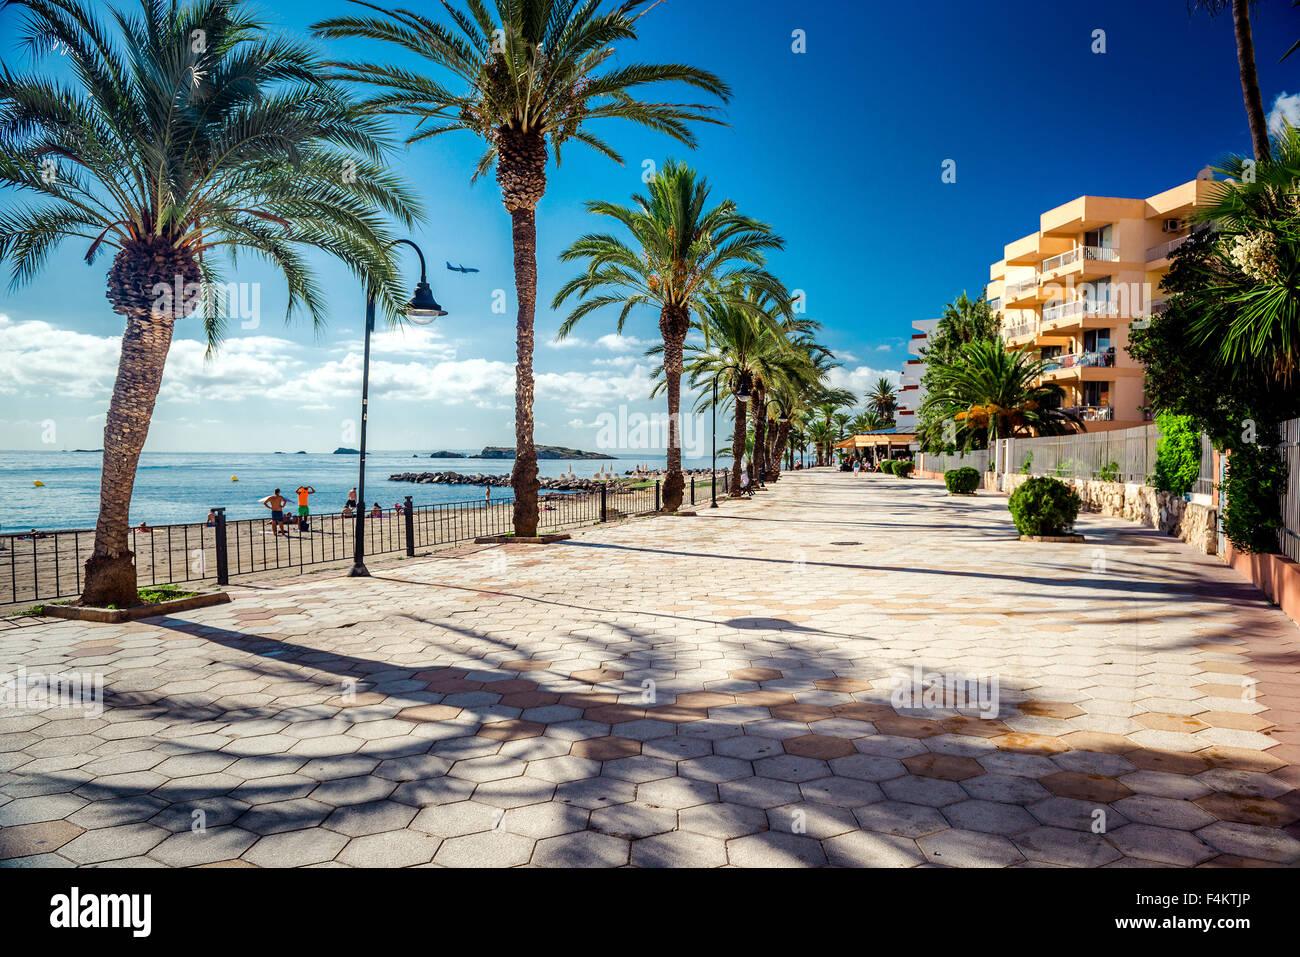 Blick auf Ibiza direkt am Meer. Spanien Stockbild